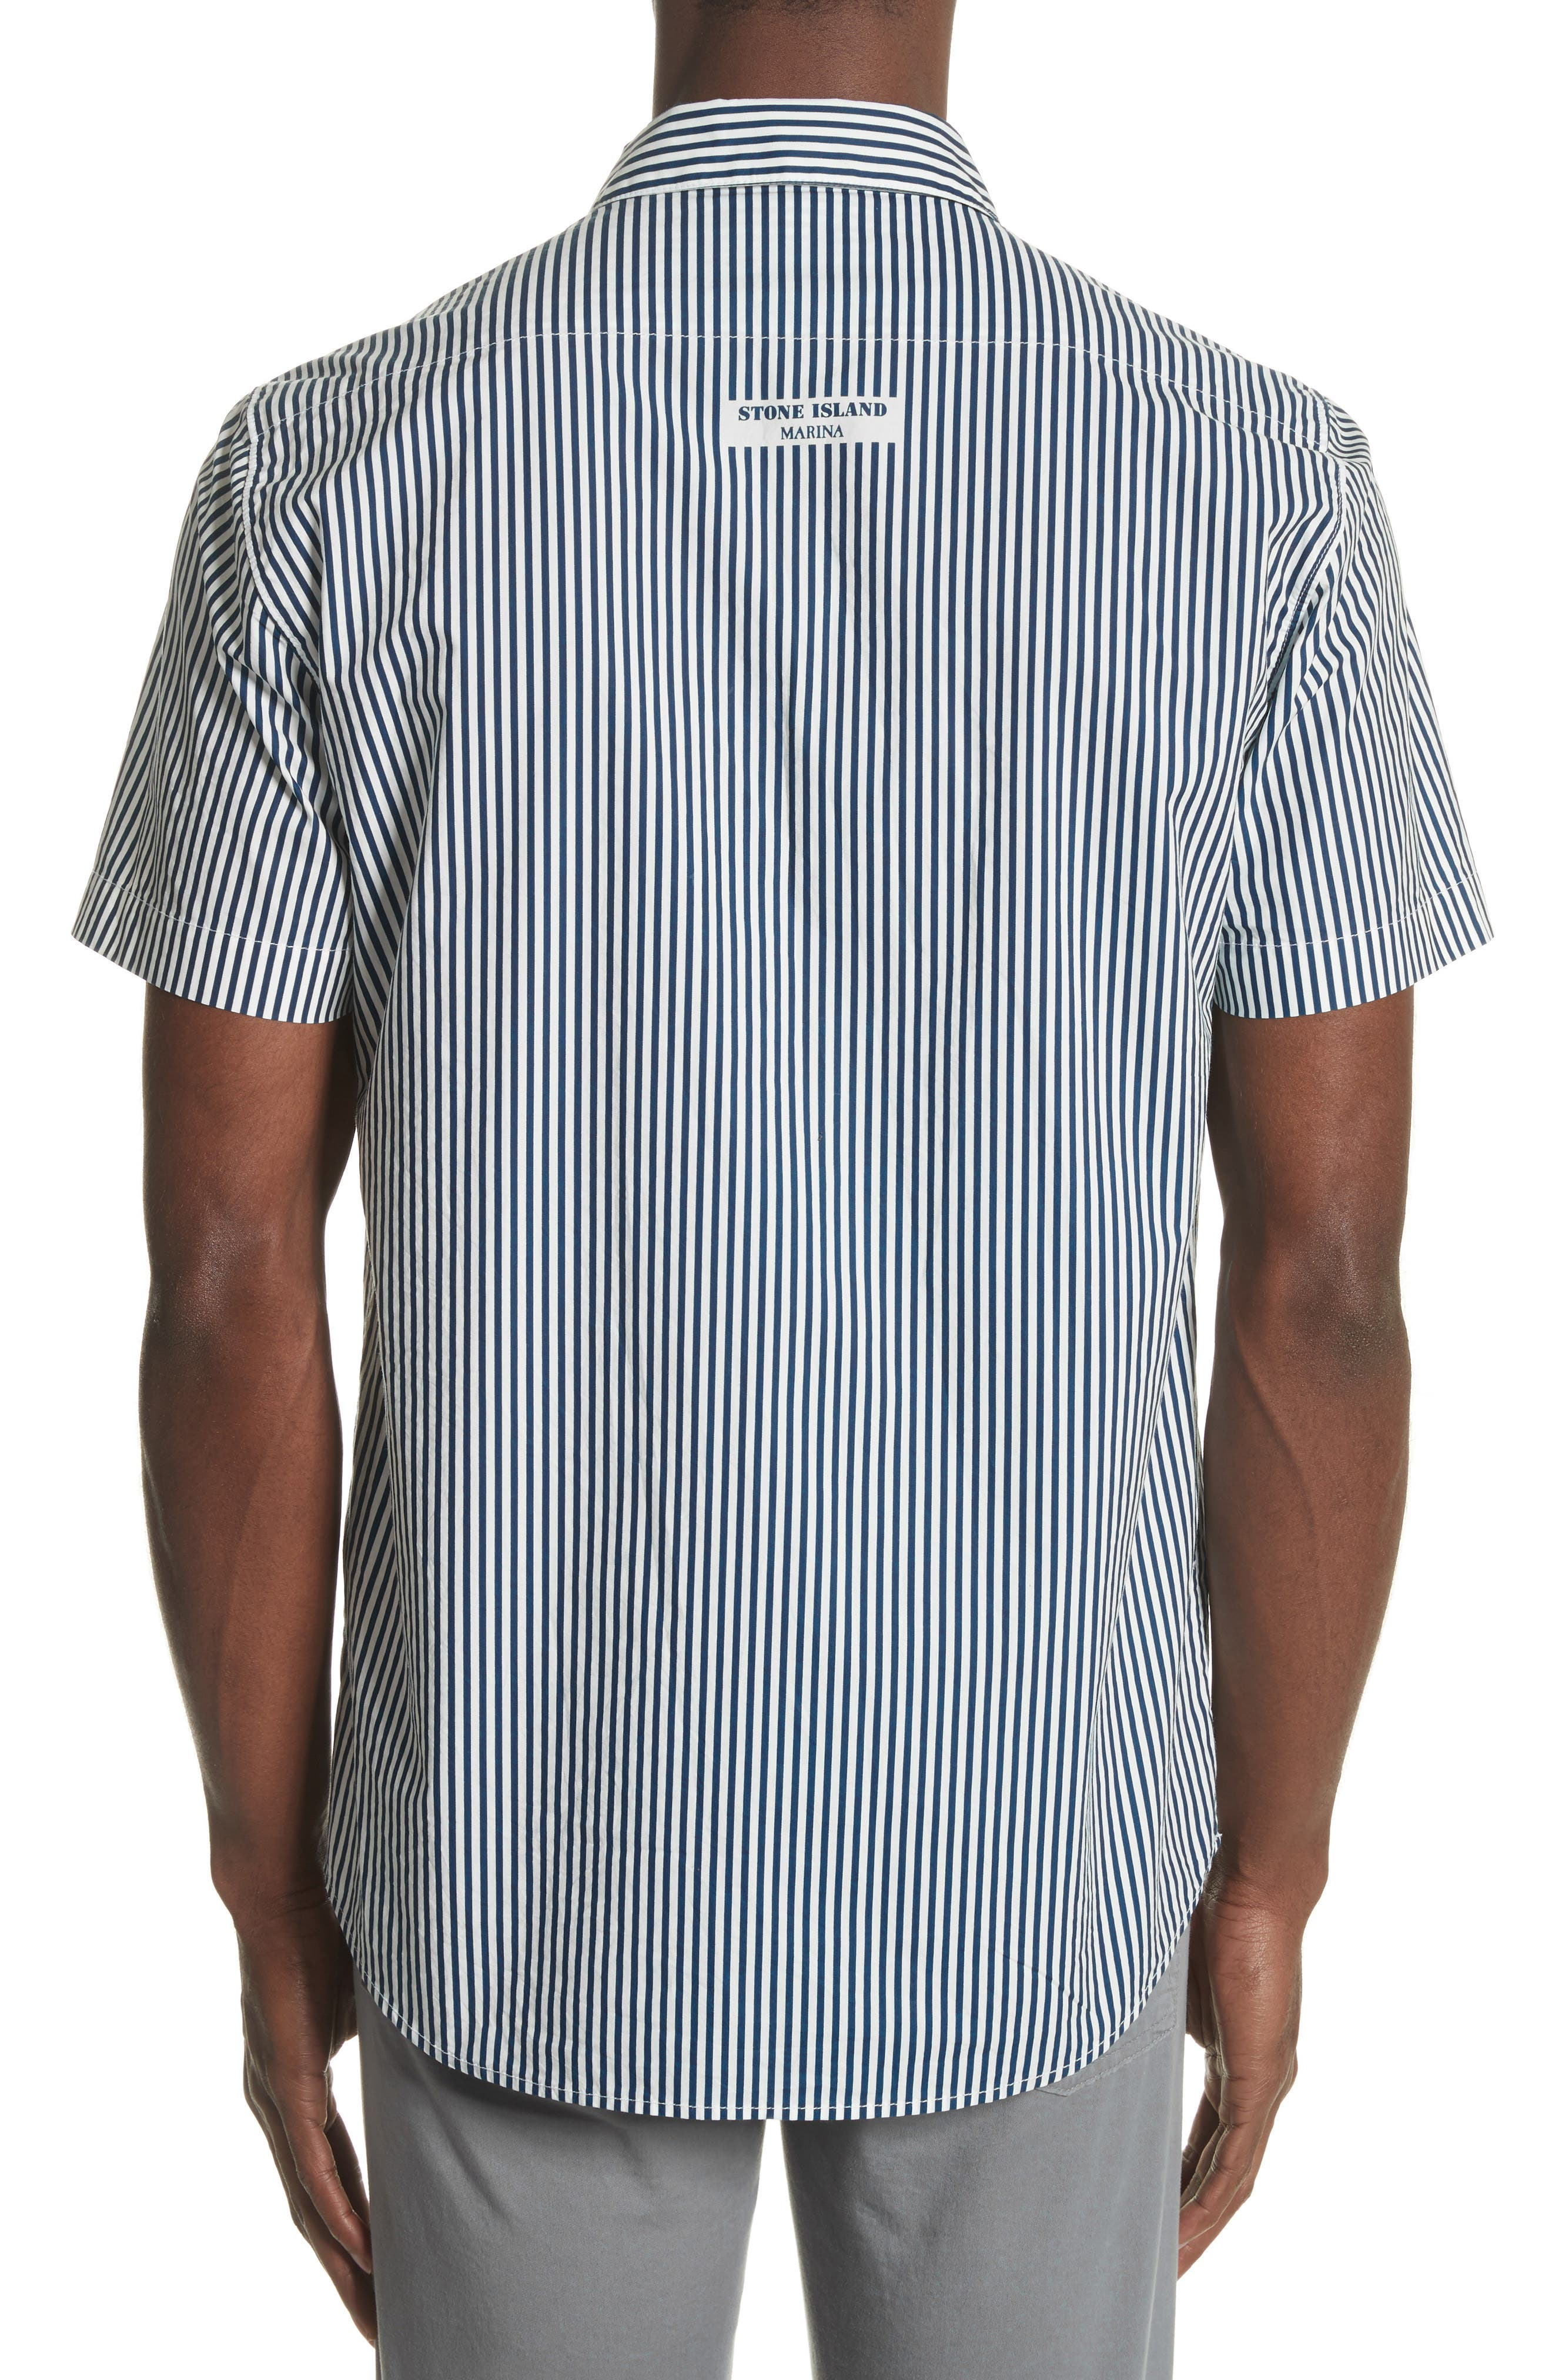 STONE ISLAND,                             Stripe Woven Shirt,                             Alternate thumbnail 2, color,                             100